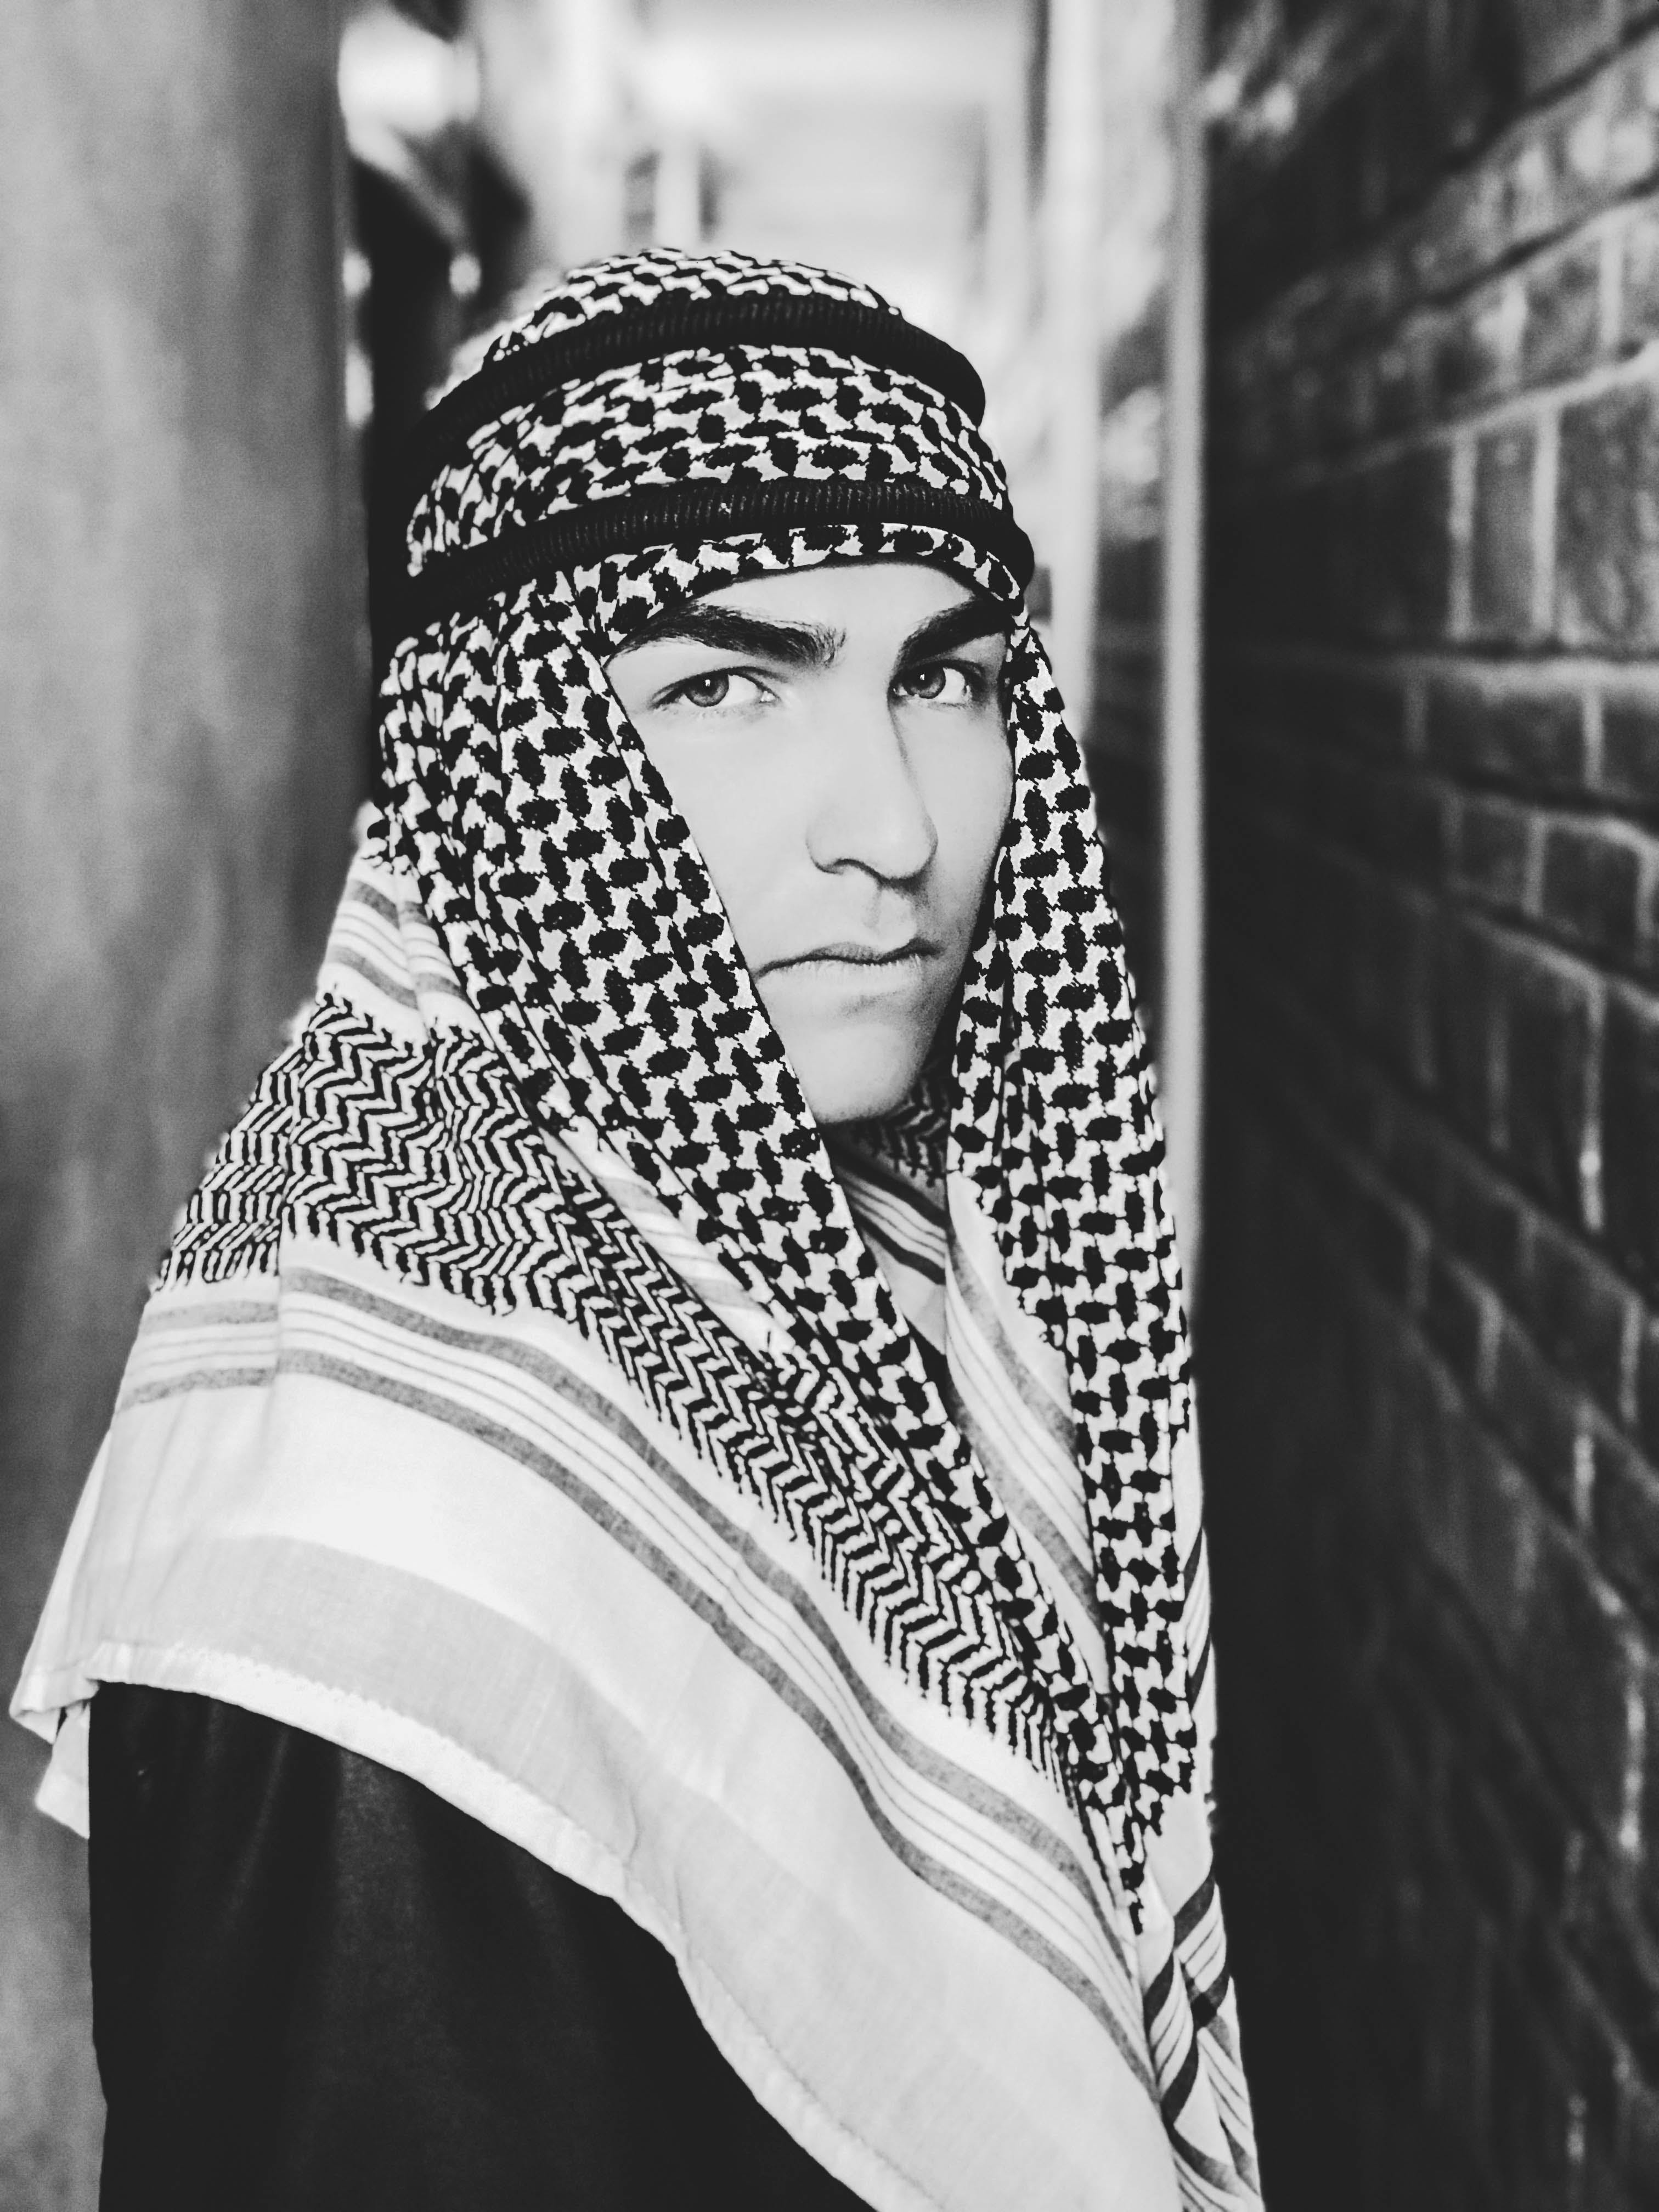 Grayscale Photo of a Man Wearing Keffiyeh